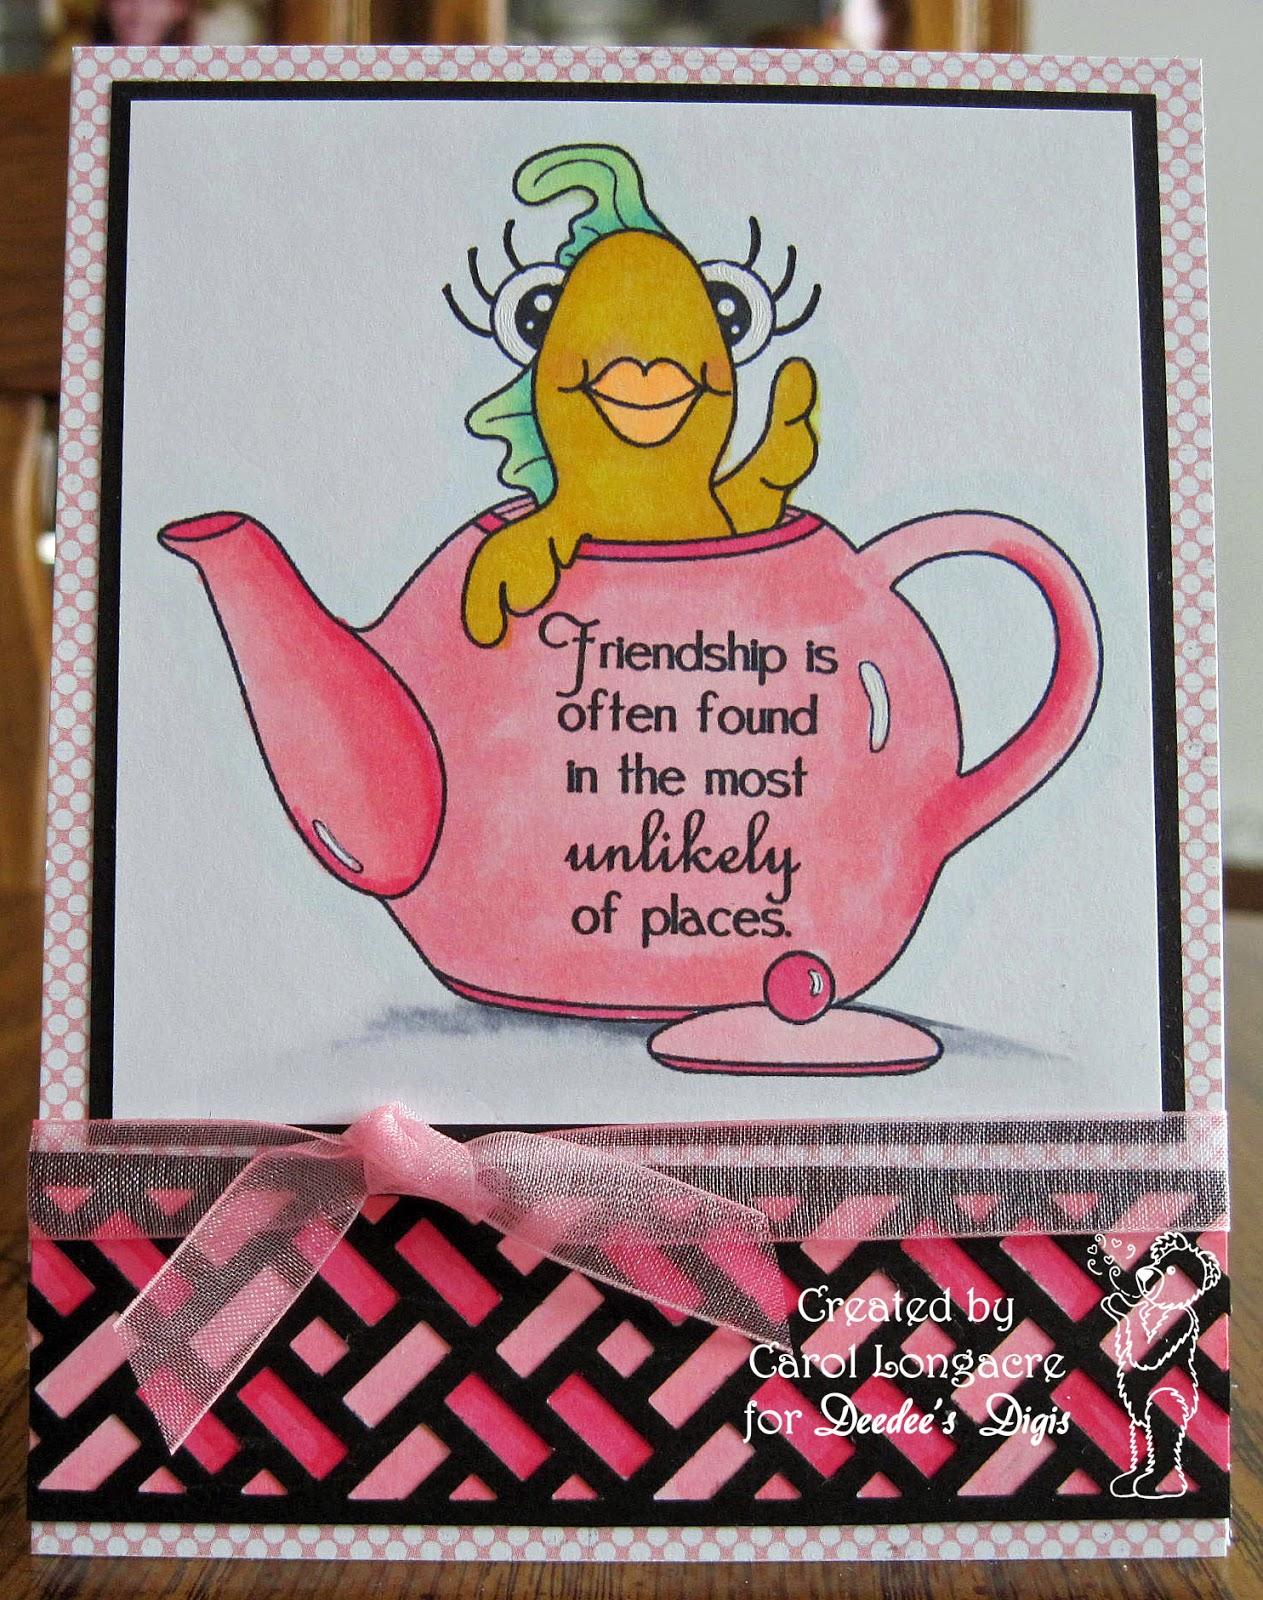 http://1.bp.blogspot.com/-nUEUfR95fmc/VPiOQJqcgcI/AAAAAAAAB_s/jMgcGvMOnBA/s1600/Friendship-Carol.jpg